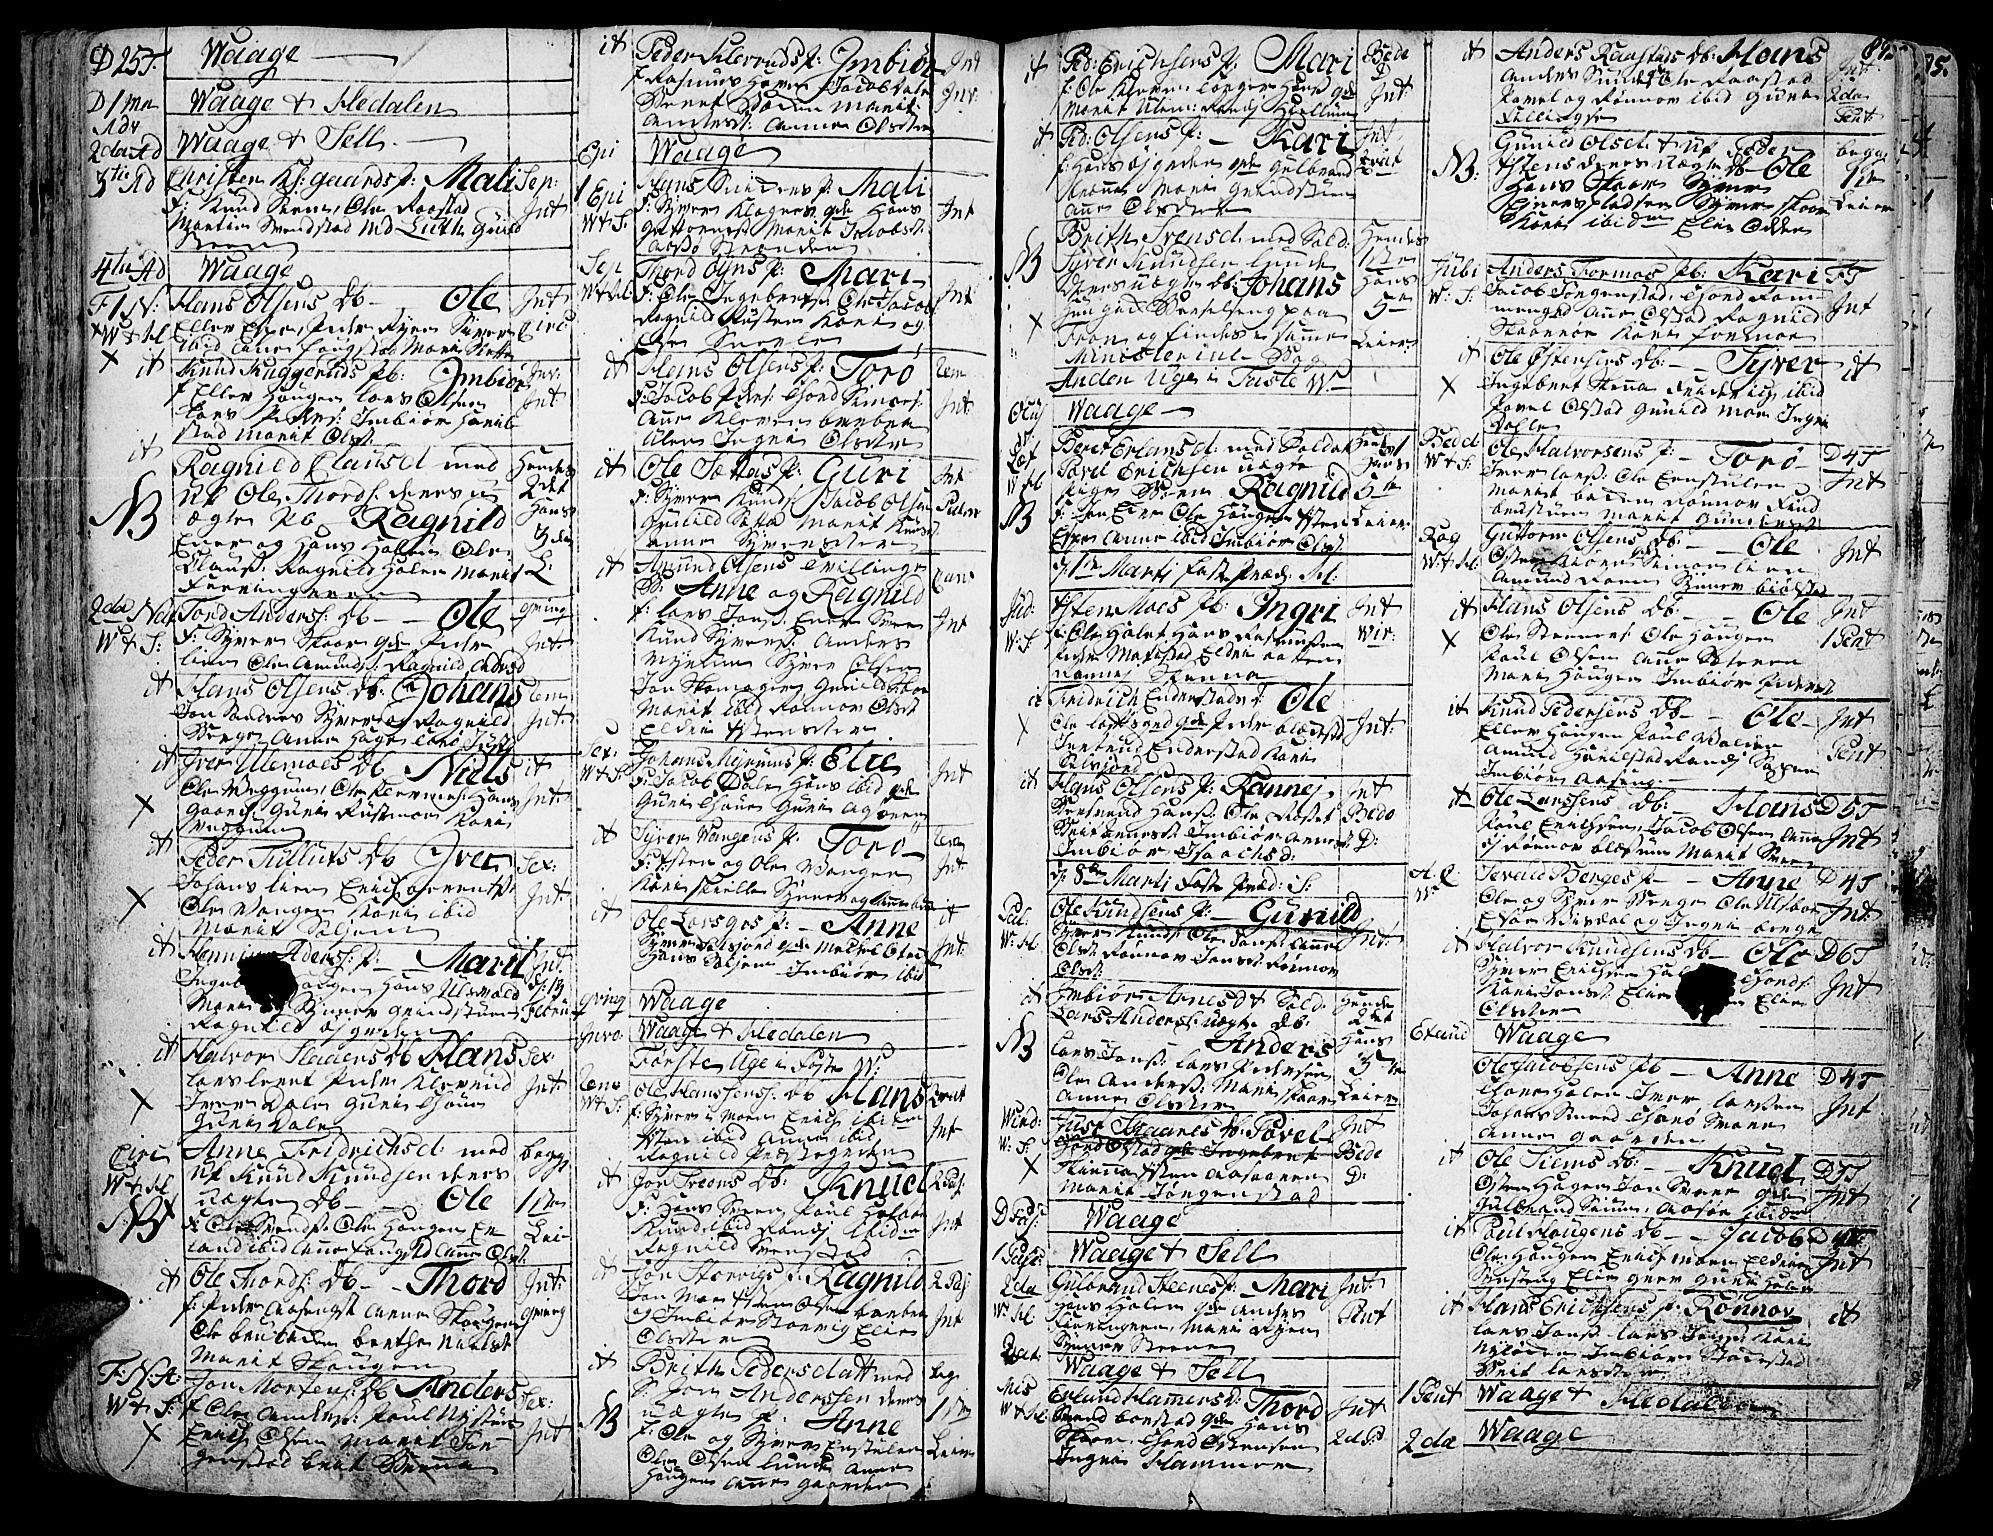 SAH, Vågå prestekontor, Ministerialbok nr. 1, 1739-1810, s. 87